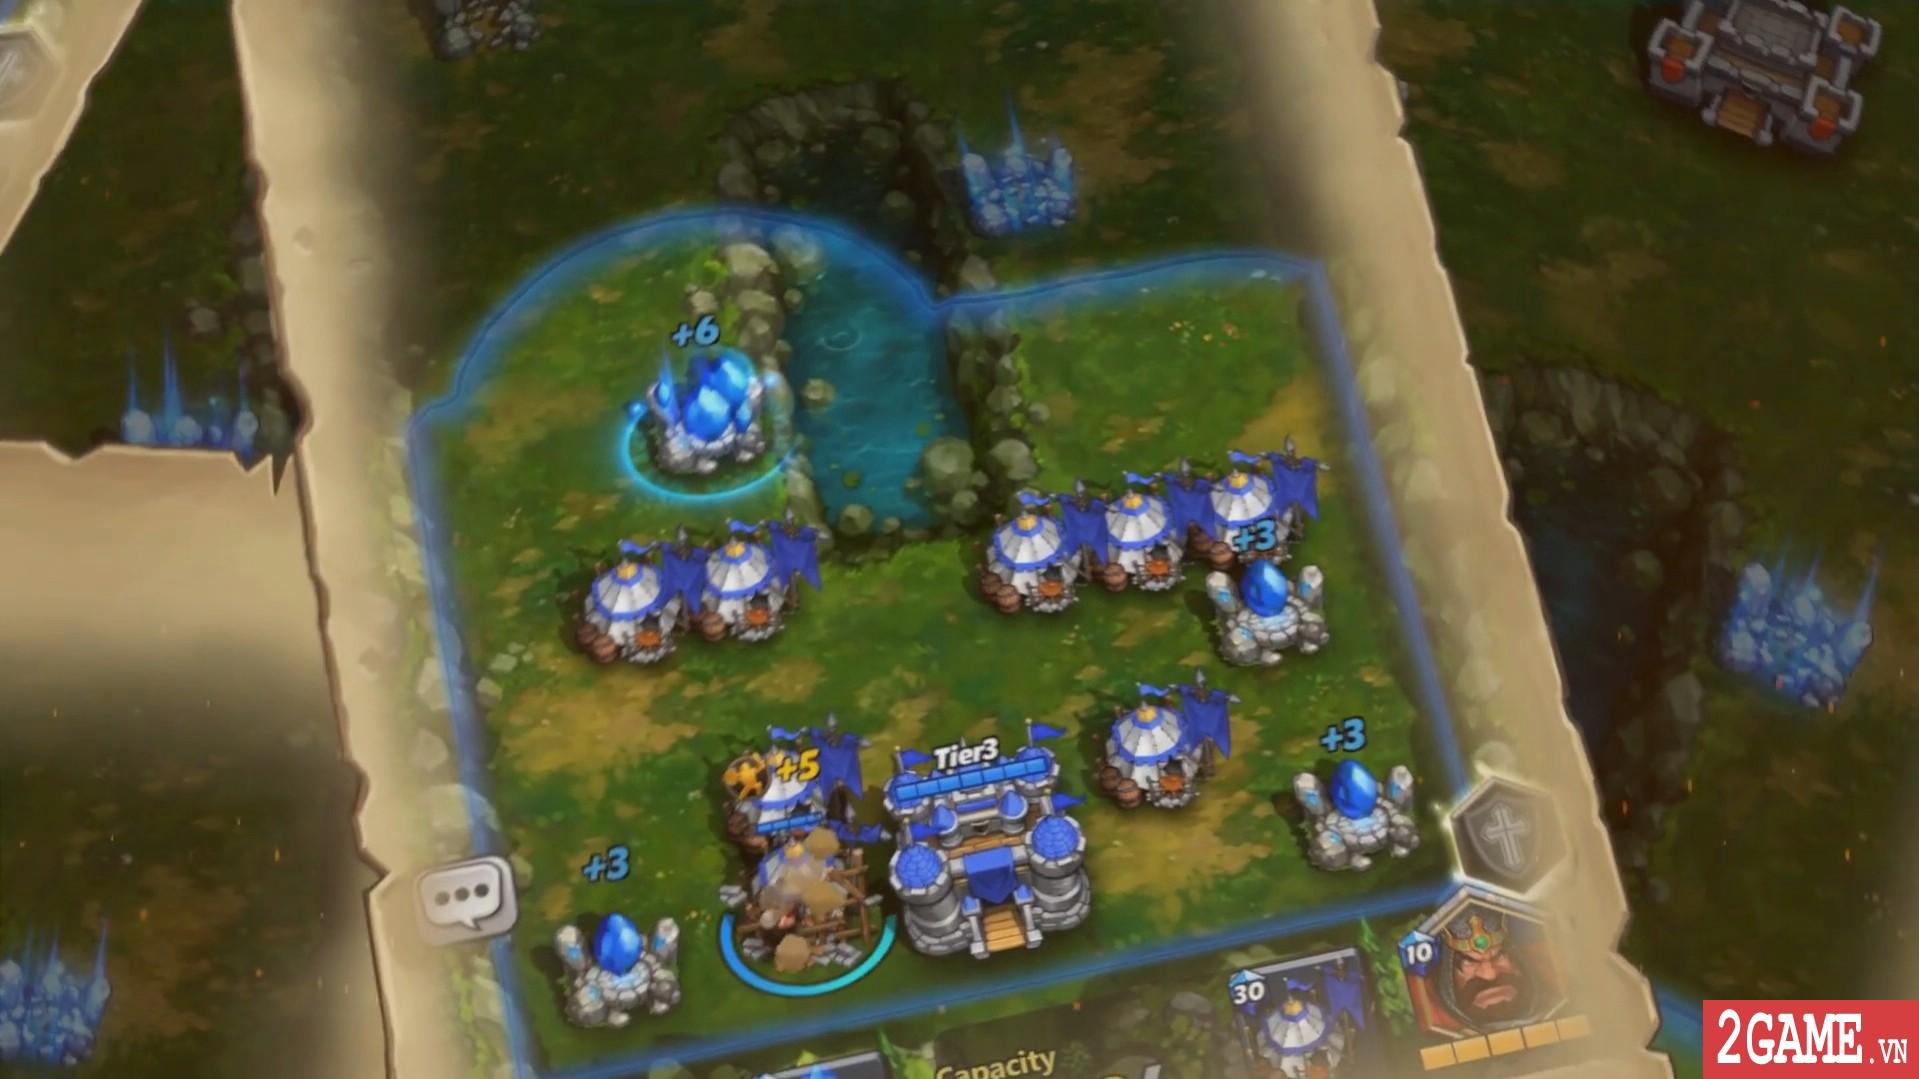 Castle Burn – Game phong cách Clash Royale đầy cuốn hút 1